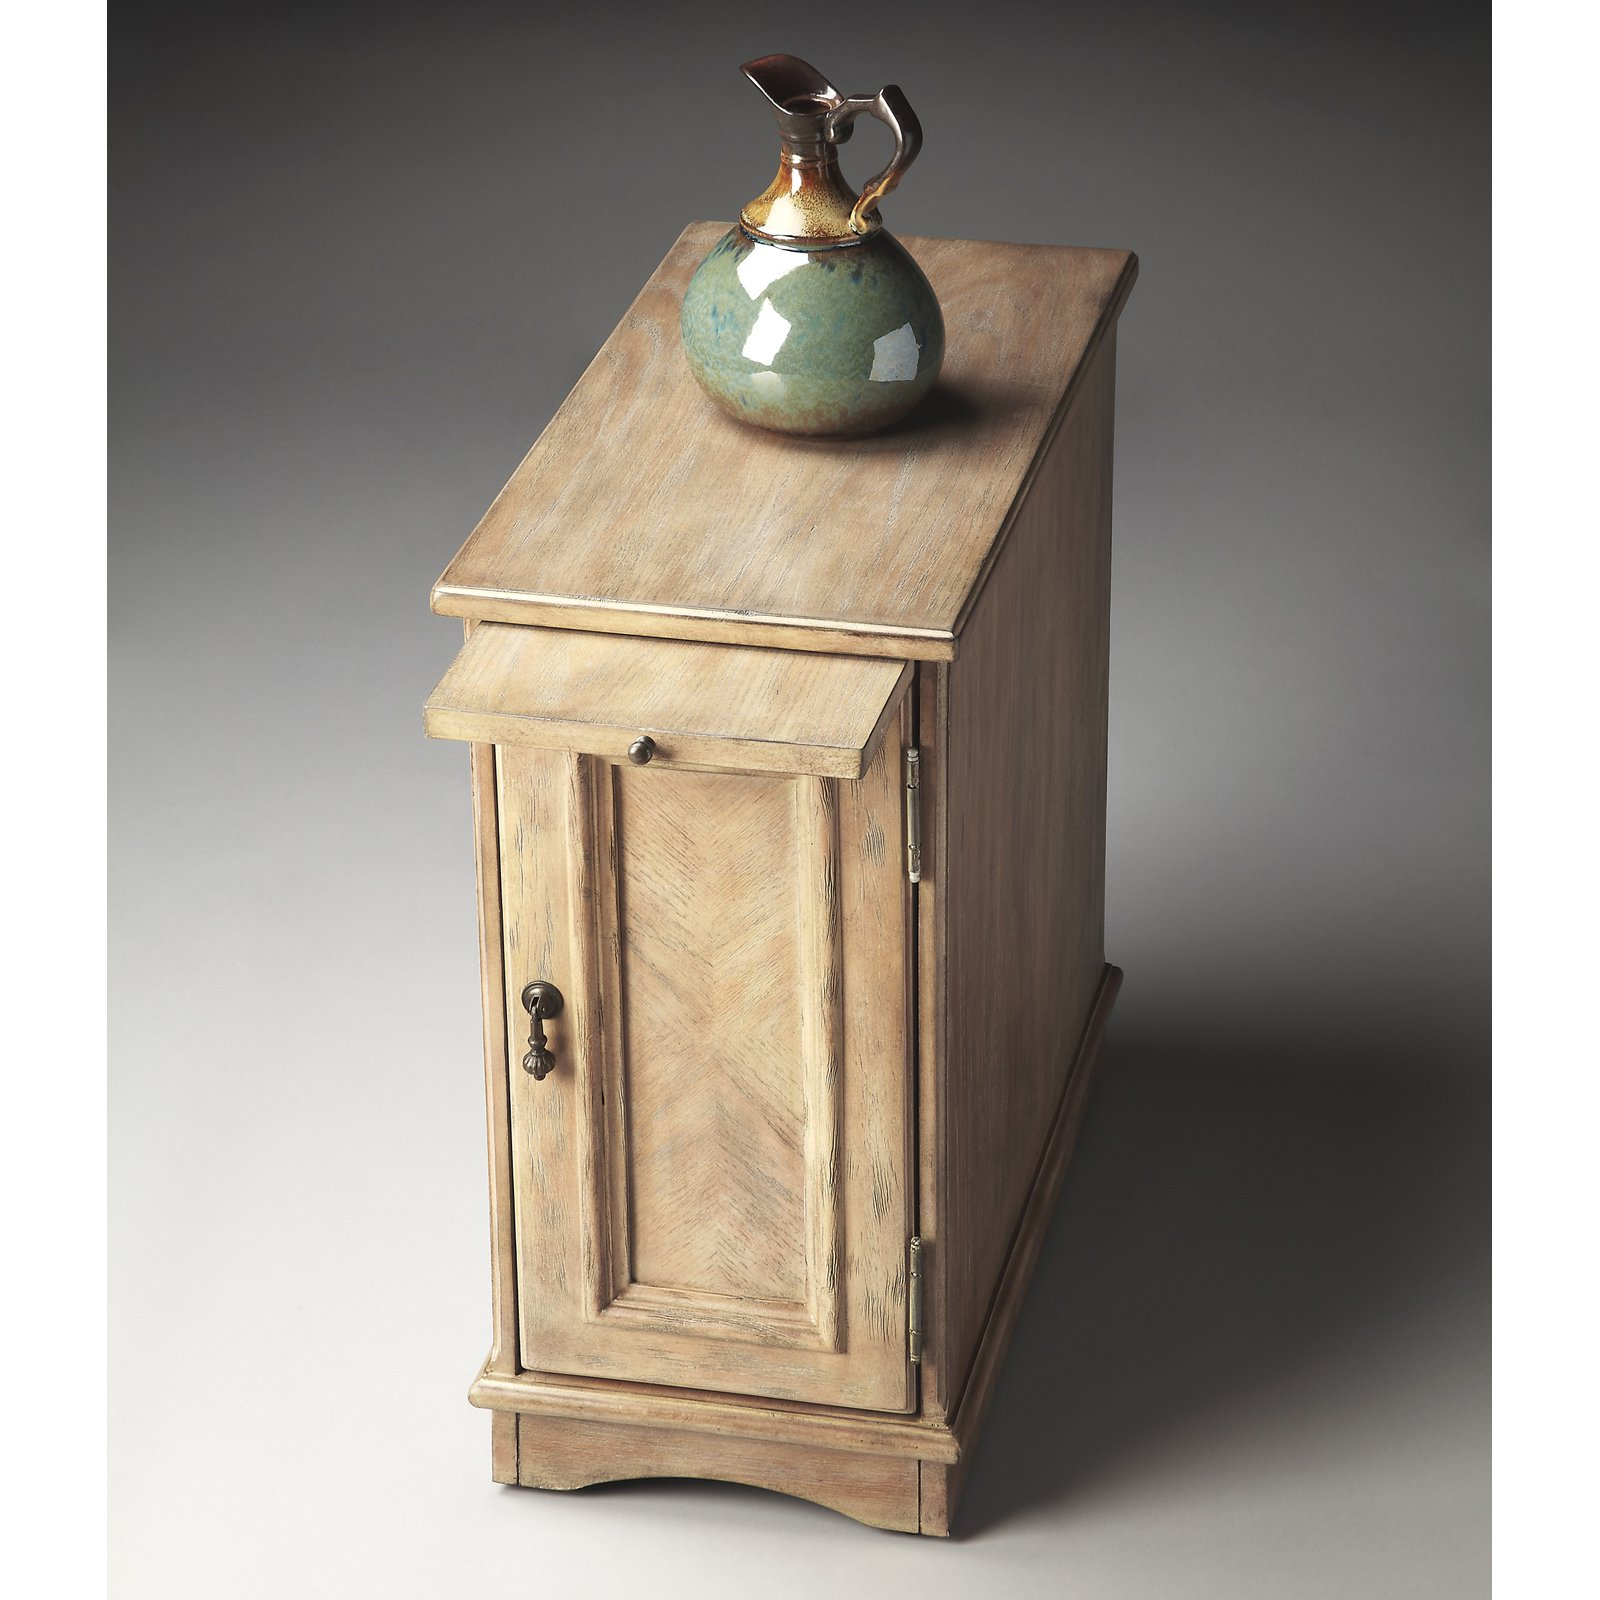 Butler Chairside Chest - Driftwood